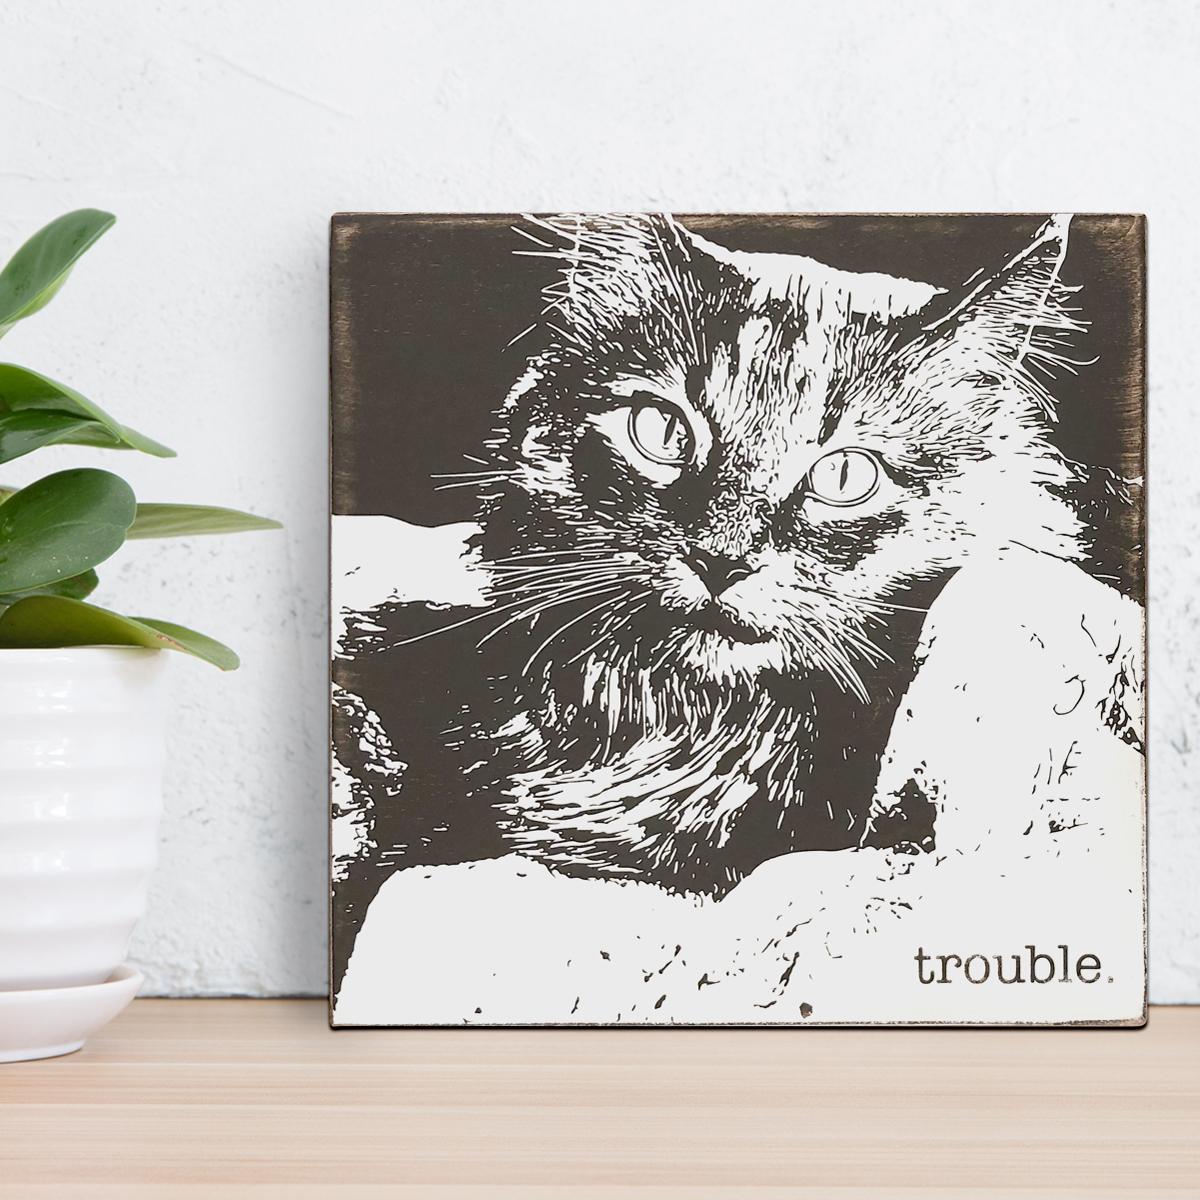 trouble_portrait.jpg